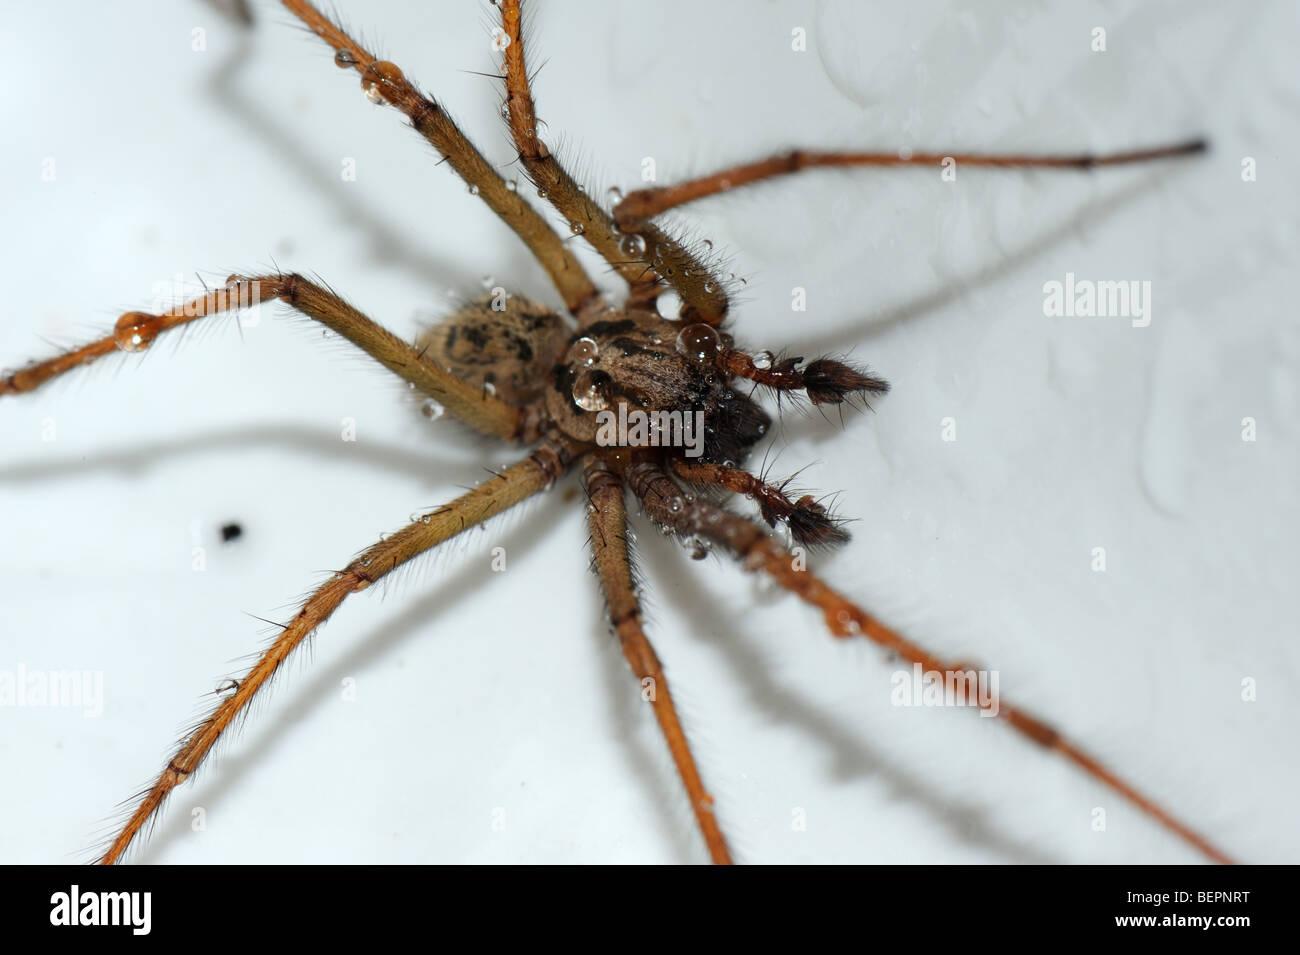 House Spider (Tegenaria Gigantea) In A Kitchen Sink And Slightly Wet